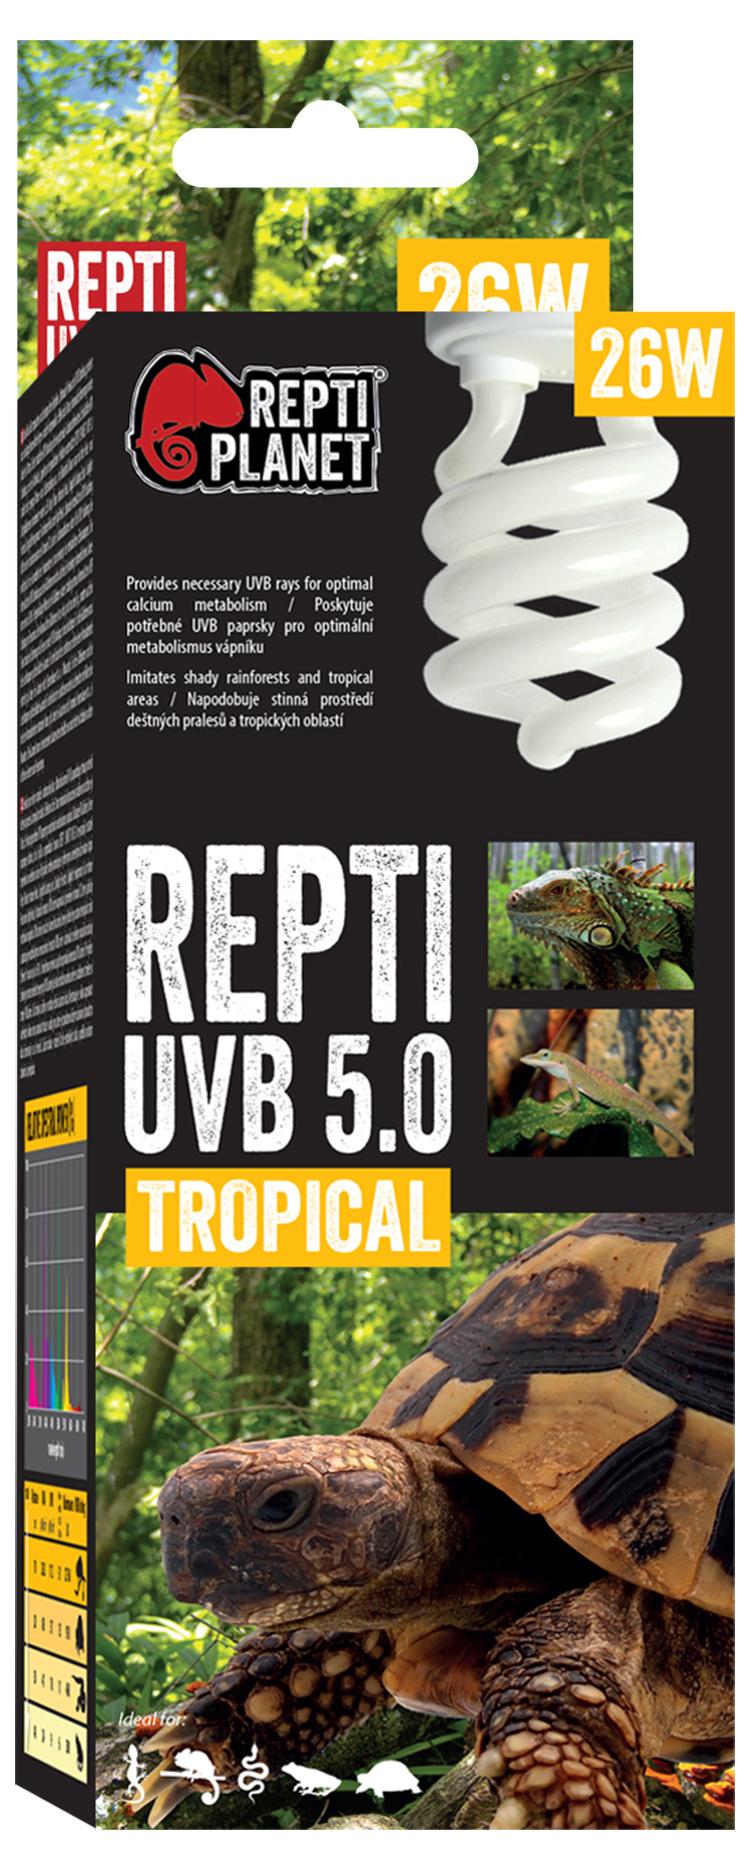 Лампа для террариумов - ReptiPlanet Repti UVB 5.0, 26W